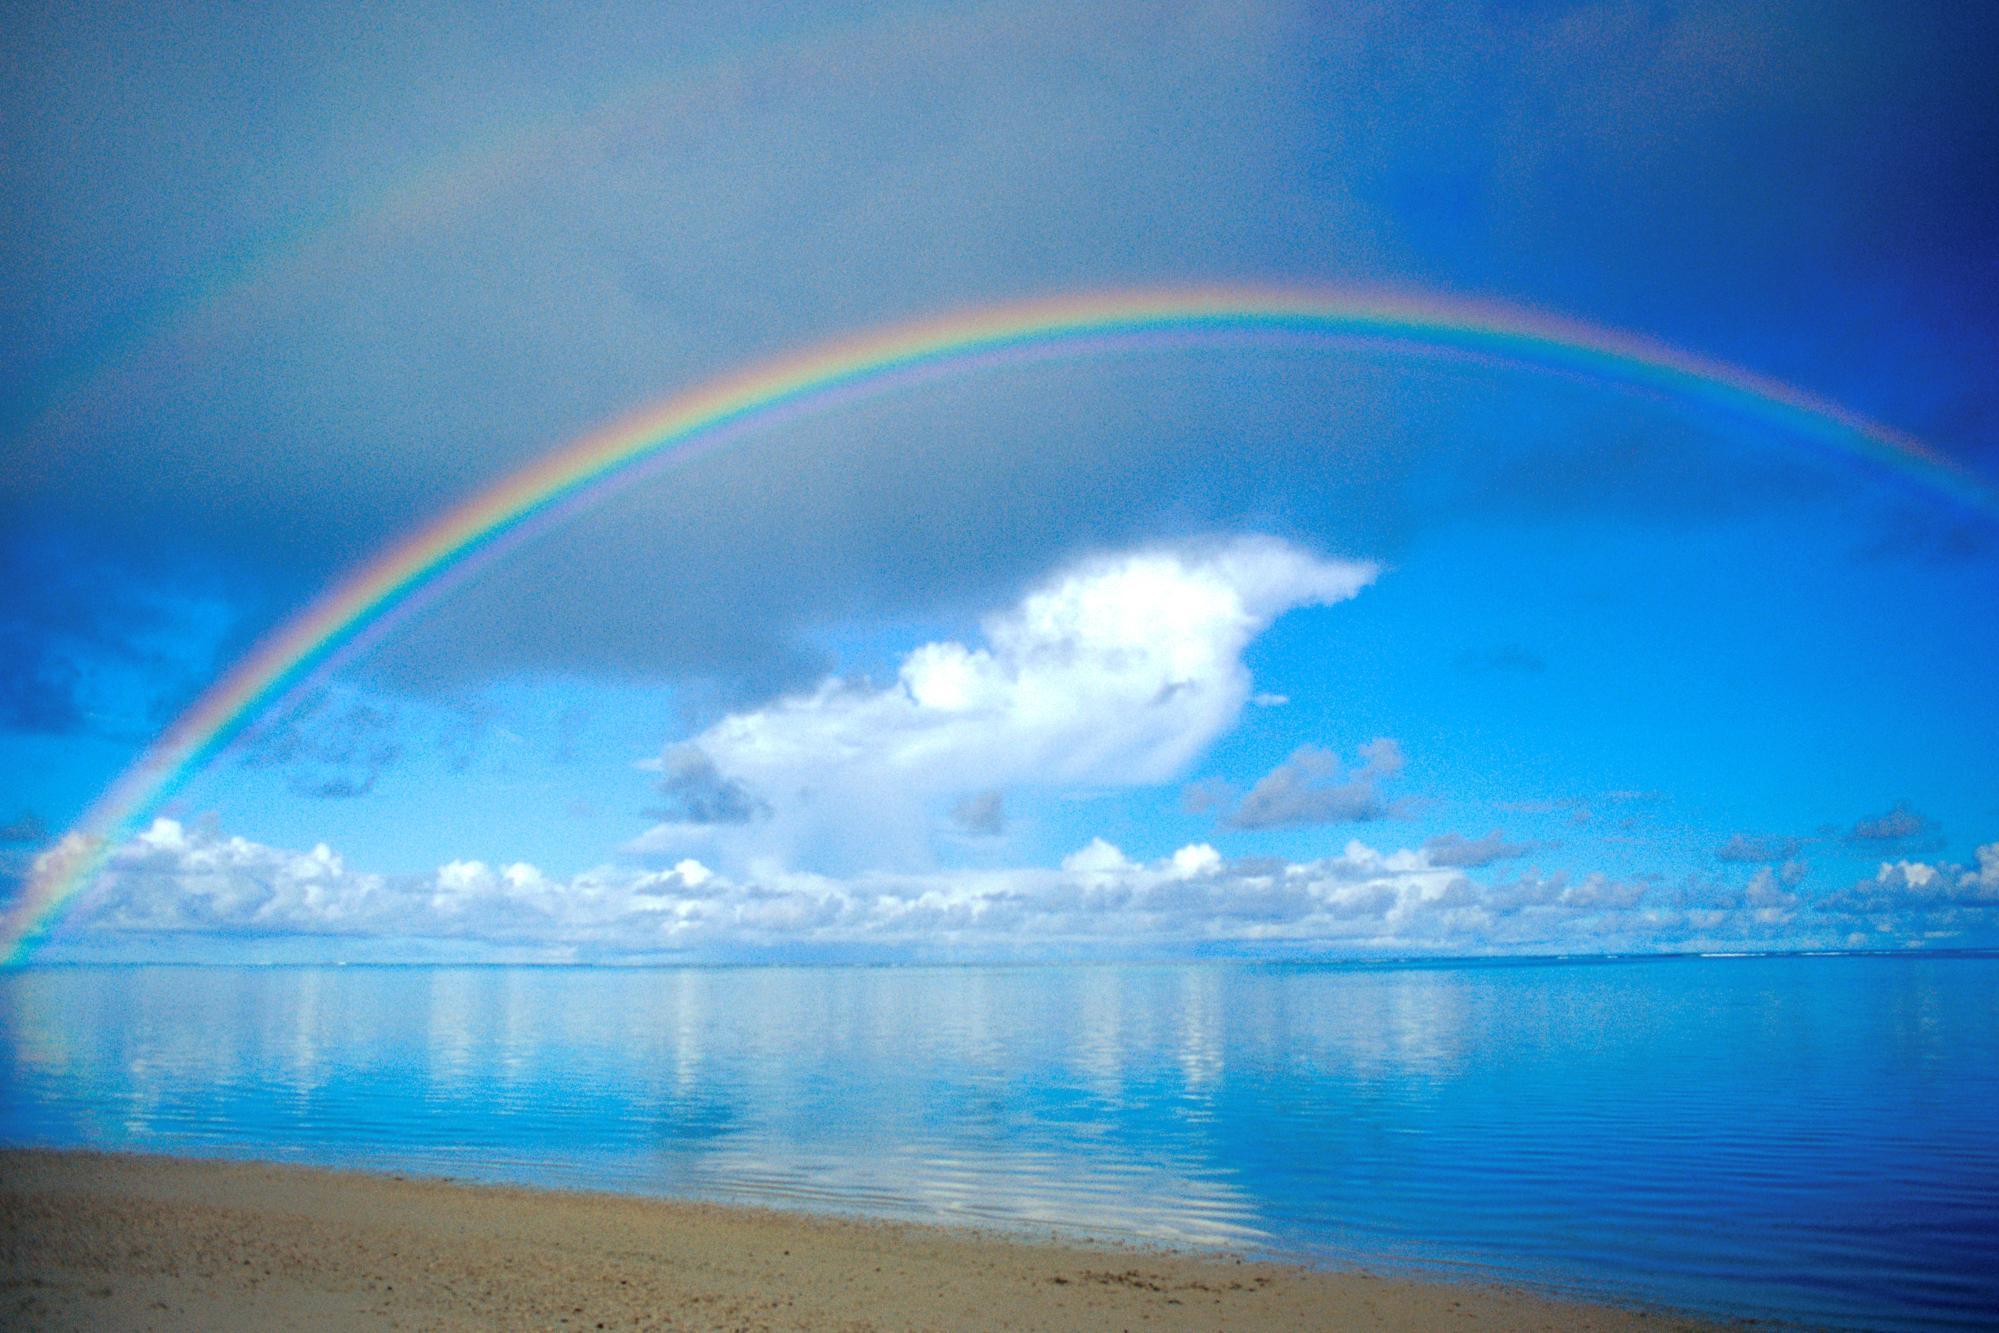 rainbow over sea free desktop background free wallpaper image